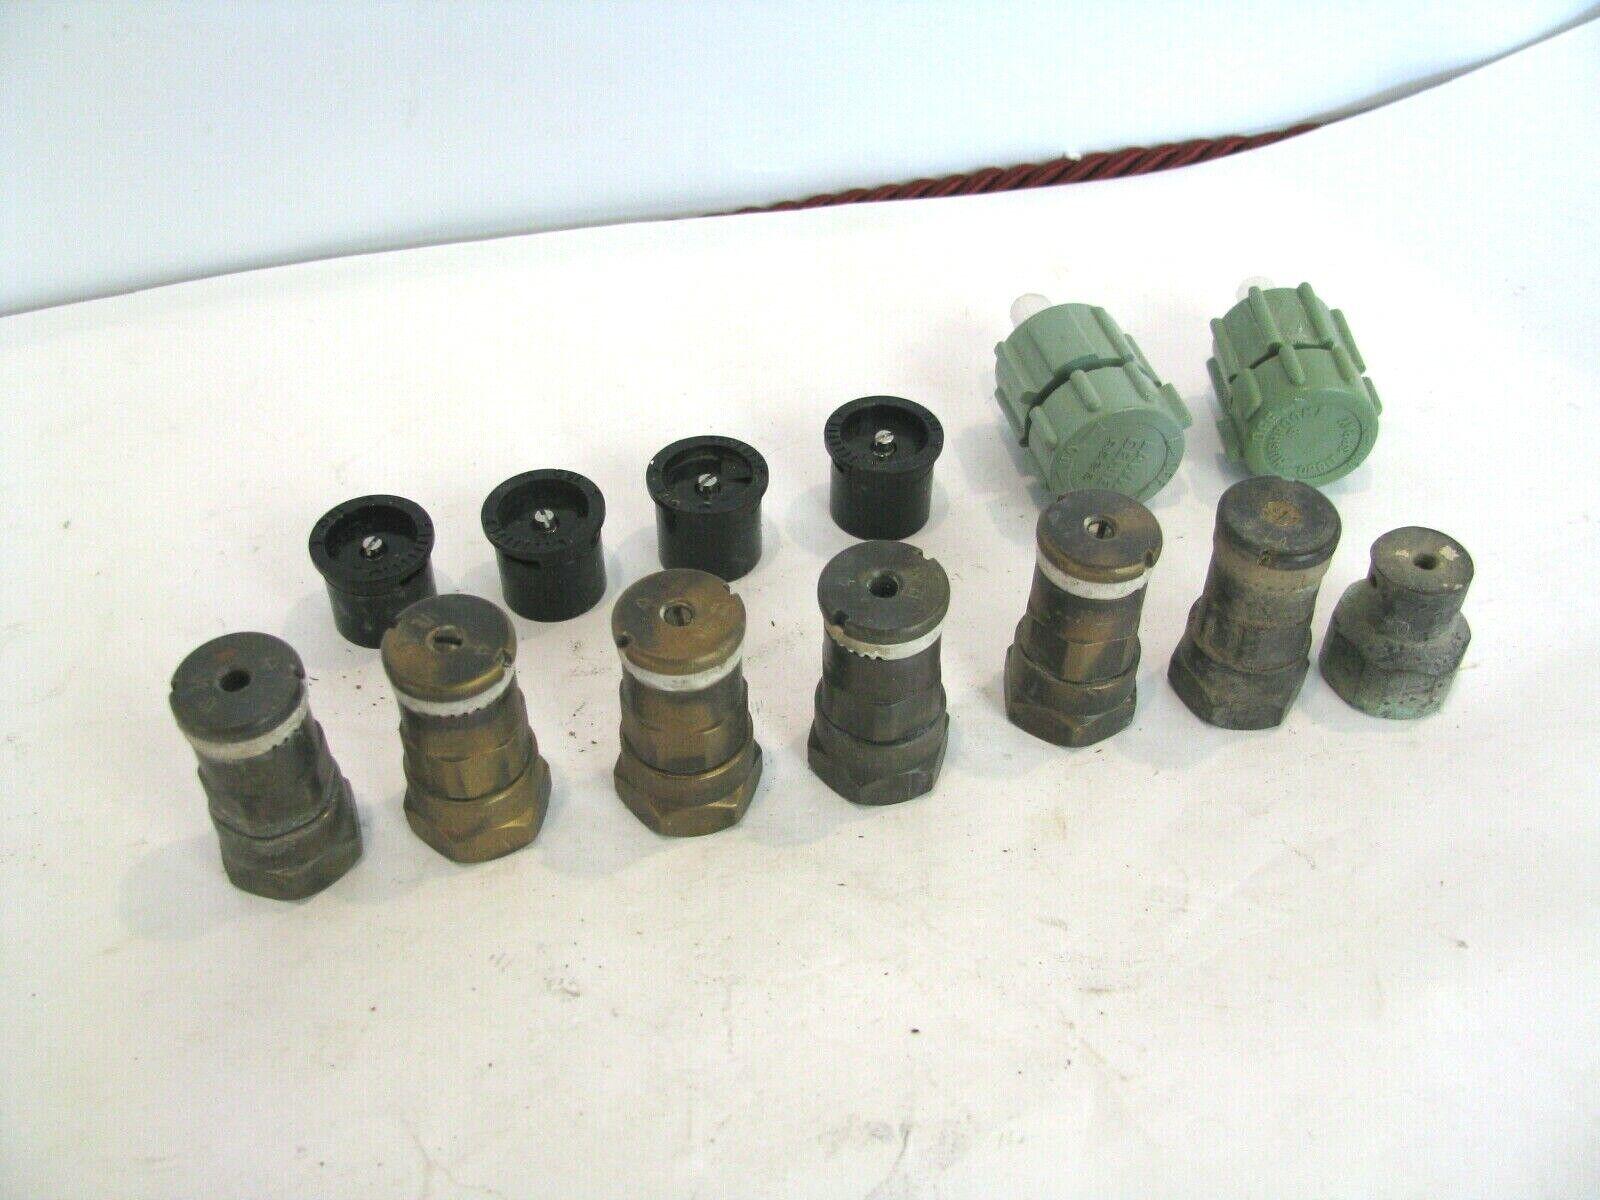 13 Brass Plastic Sprinkler System 360 half 1/4 Shrub Hedge Spray Head 1/2 in Lot